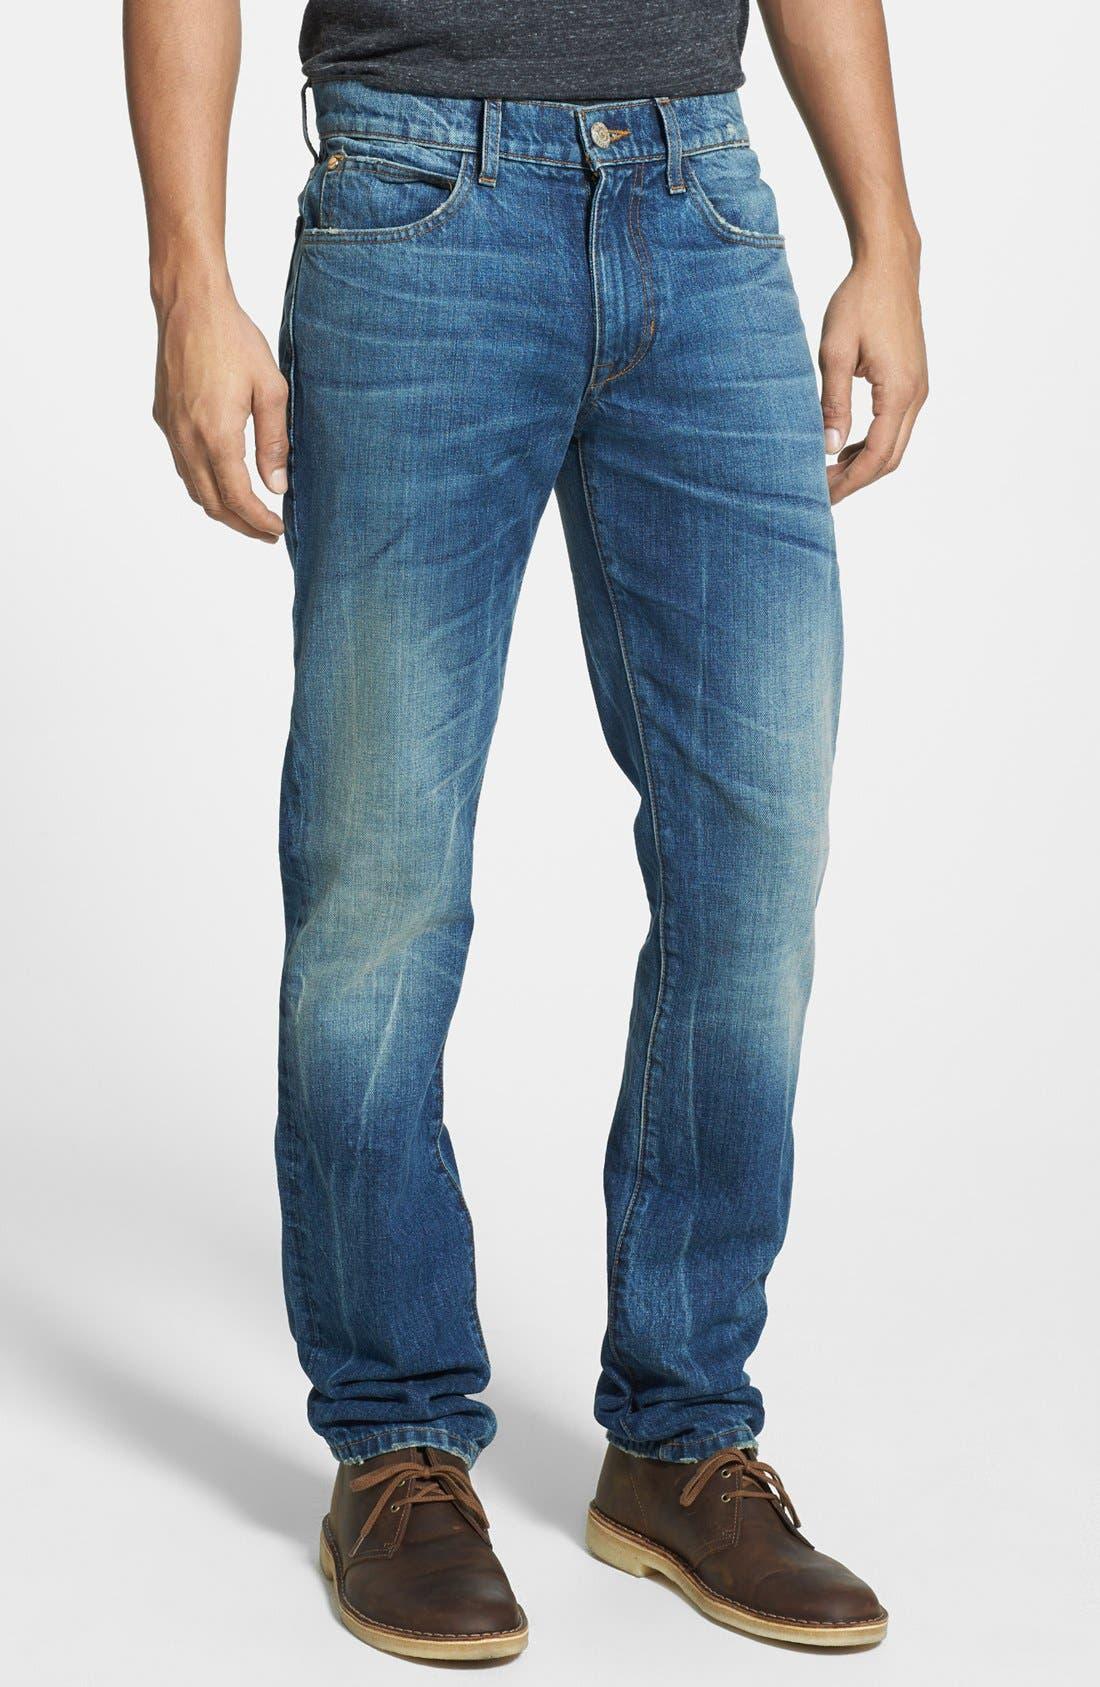 Alternate Image 1 Selected - Joe's 'Brixton' Slim Fit Jeans (Samir)